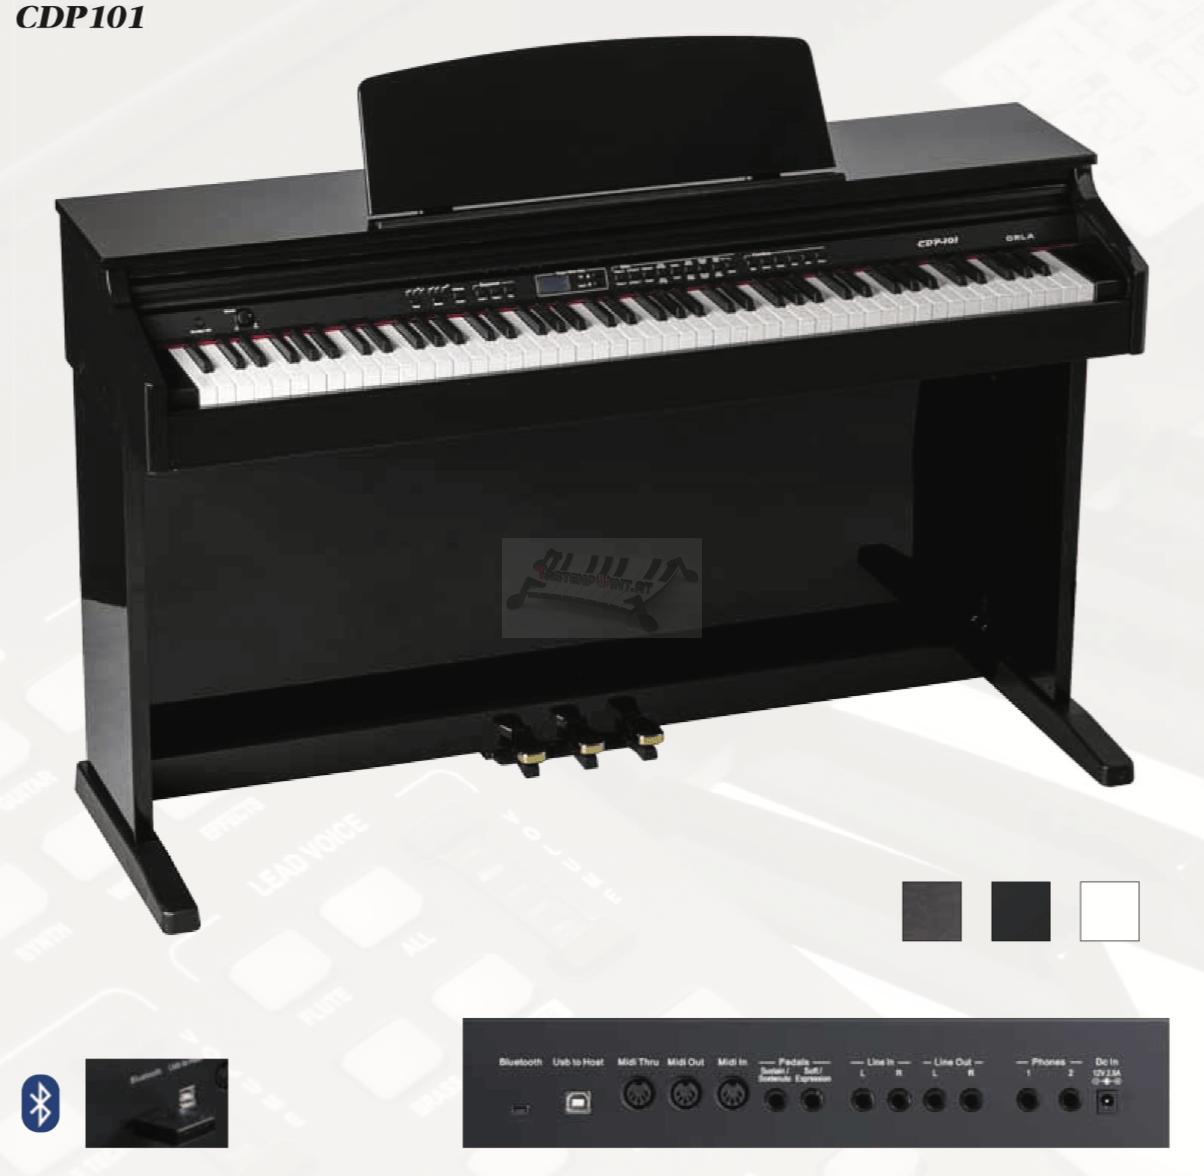 orla-CDP101